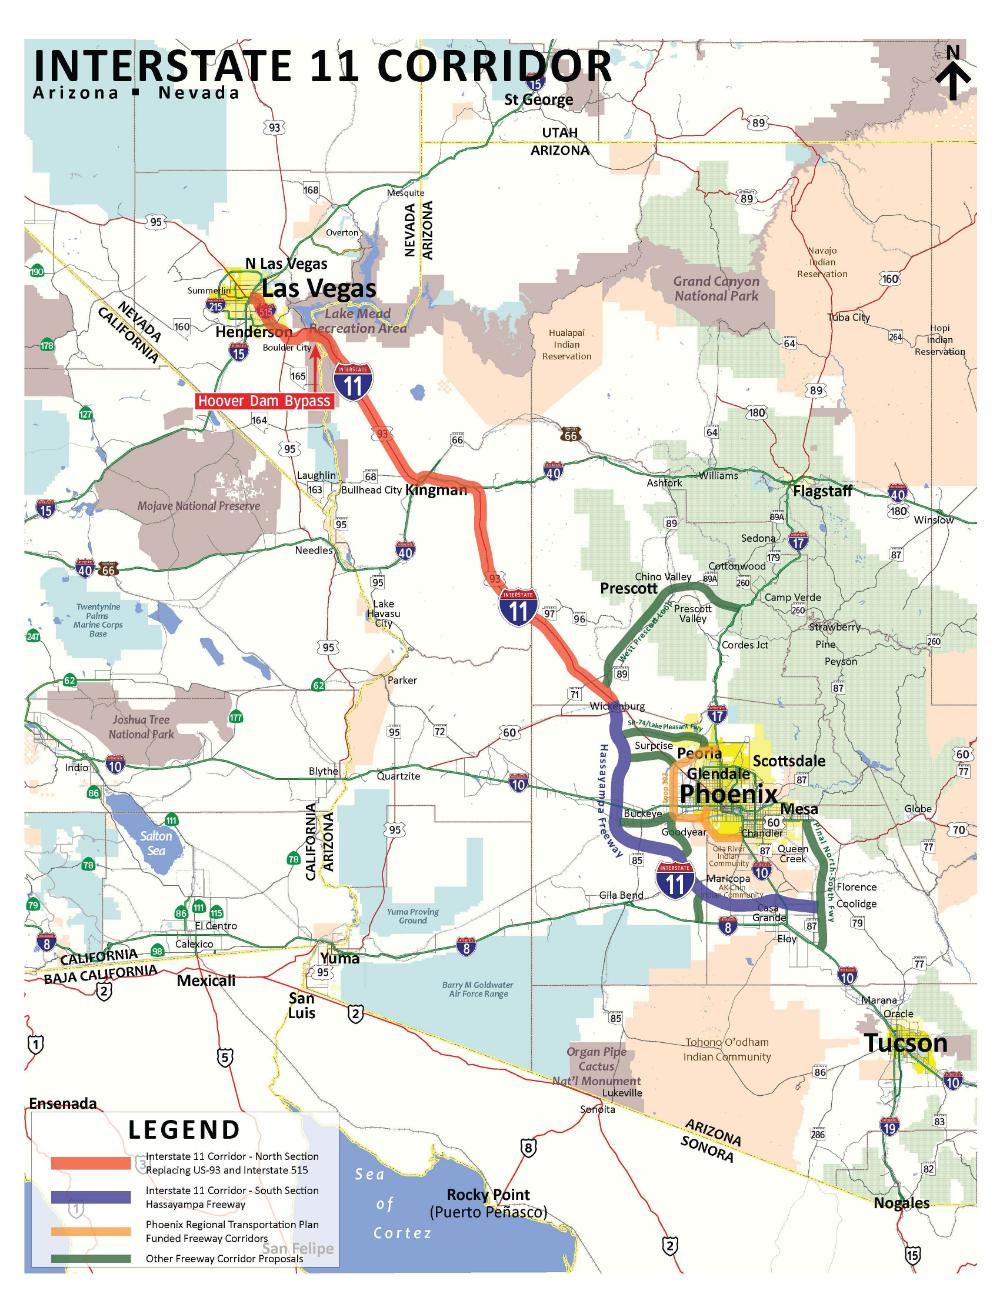 Homes For Sale in Fastest Growing US City- Buckeye AZ ... on san luis arizona map, buckeye mini storage, verrado community map, buckeye wv map, philadelphia pennsylvania on us map, buckeye valley high school map, buckeye trail map, bullhead city arizona map, bar x ranch map, buckeye union high school, arizona weather map, buckeye arizona, buckeye city, buckeye system map, arizona united states map, buckeye hills regional park,